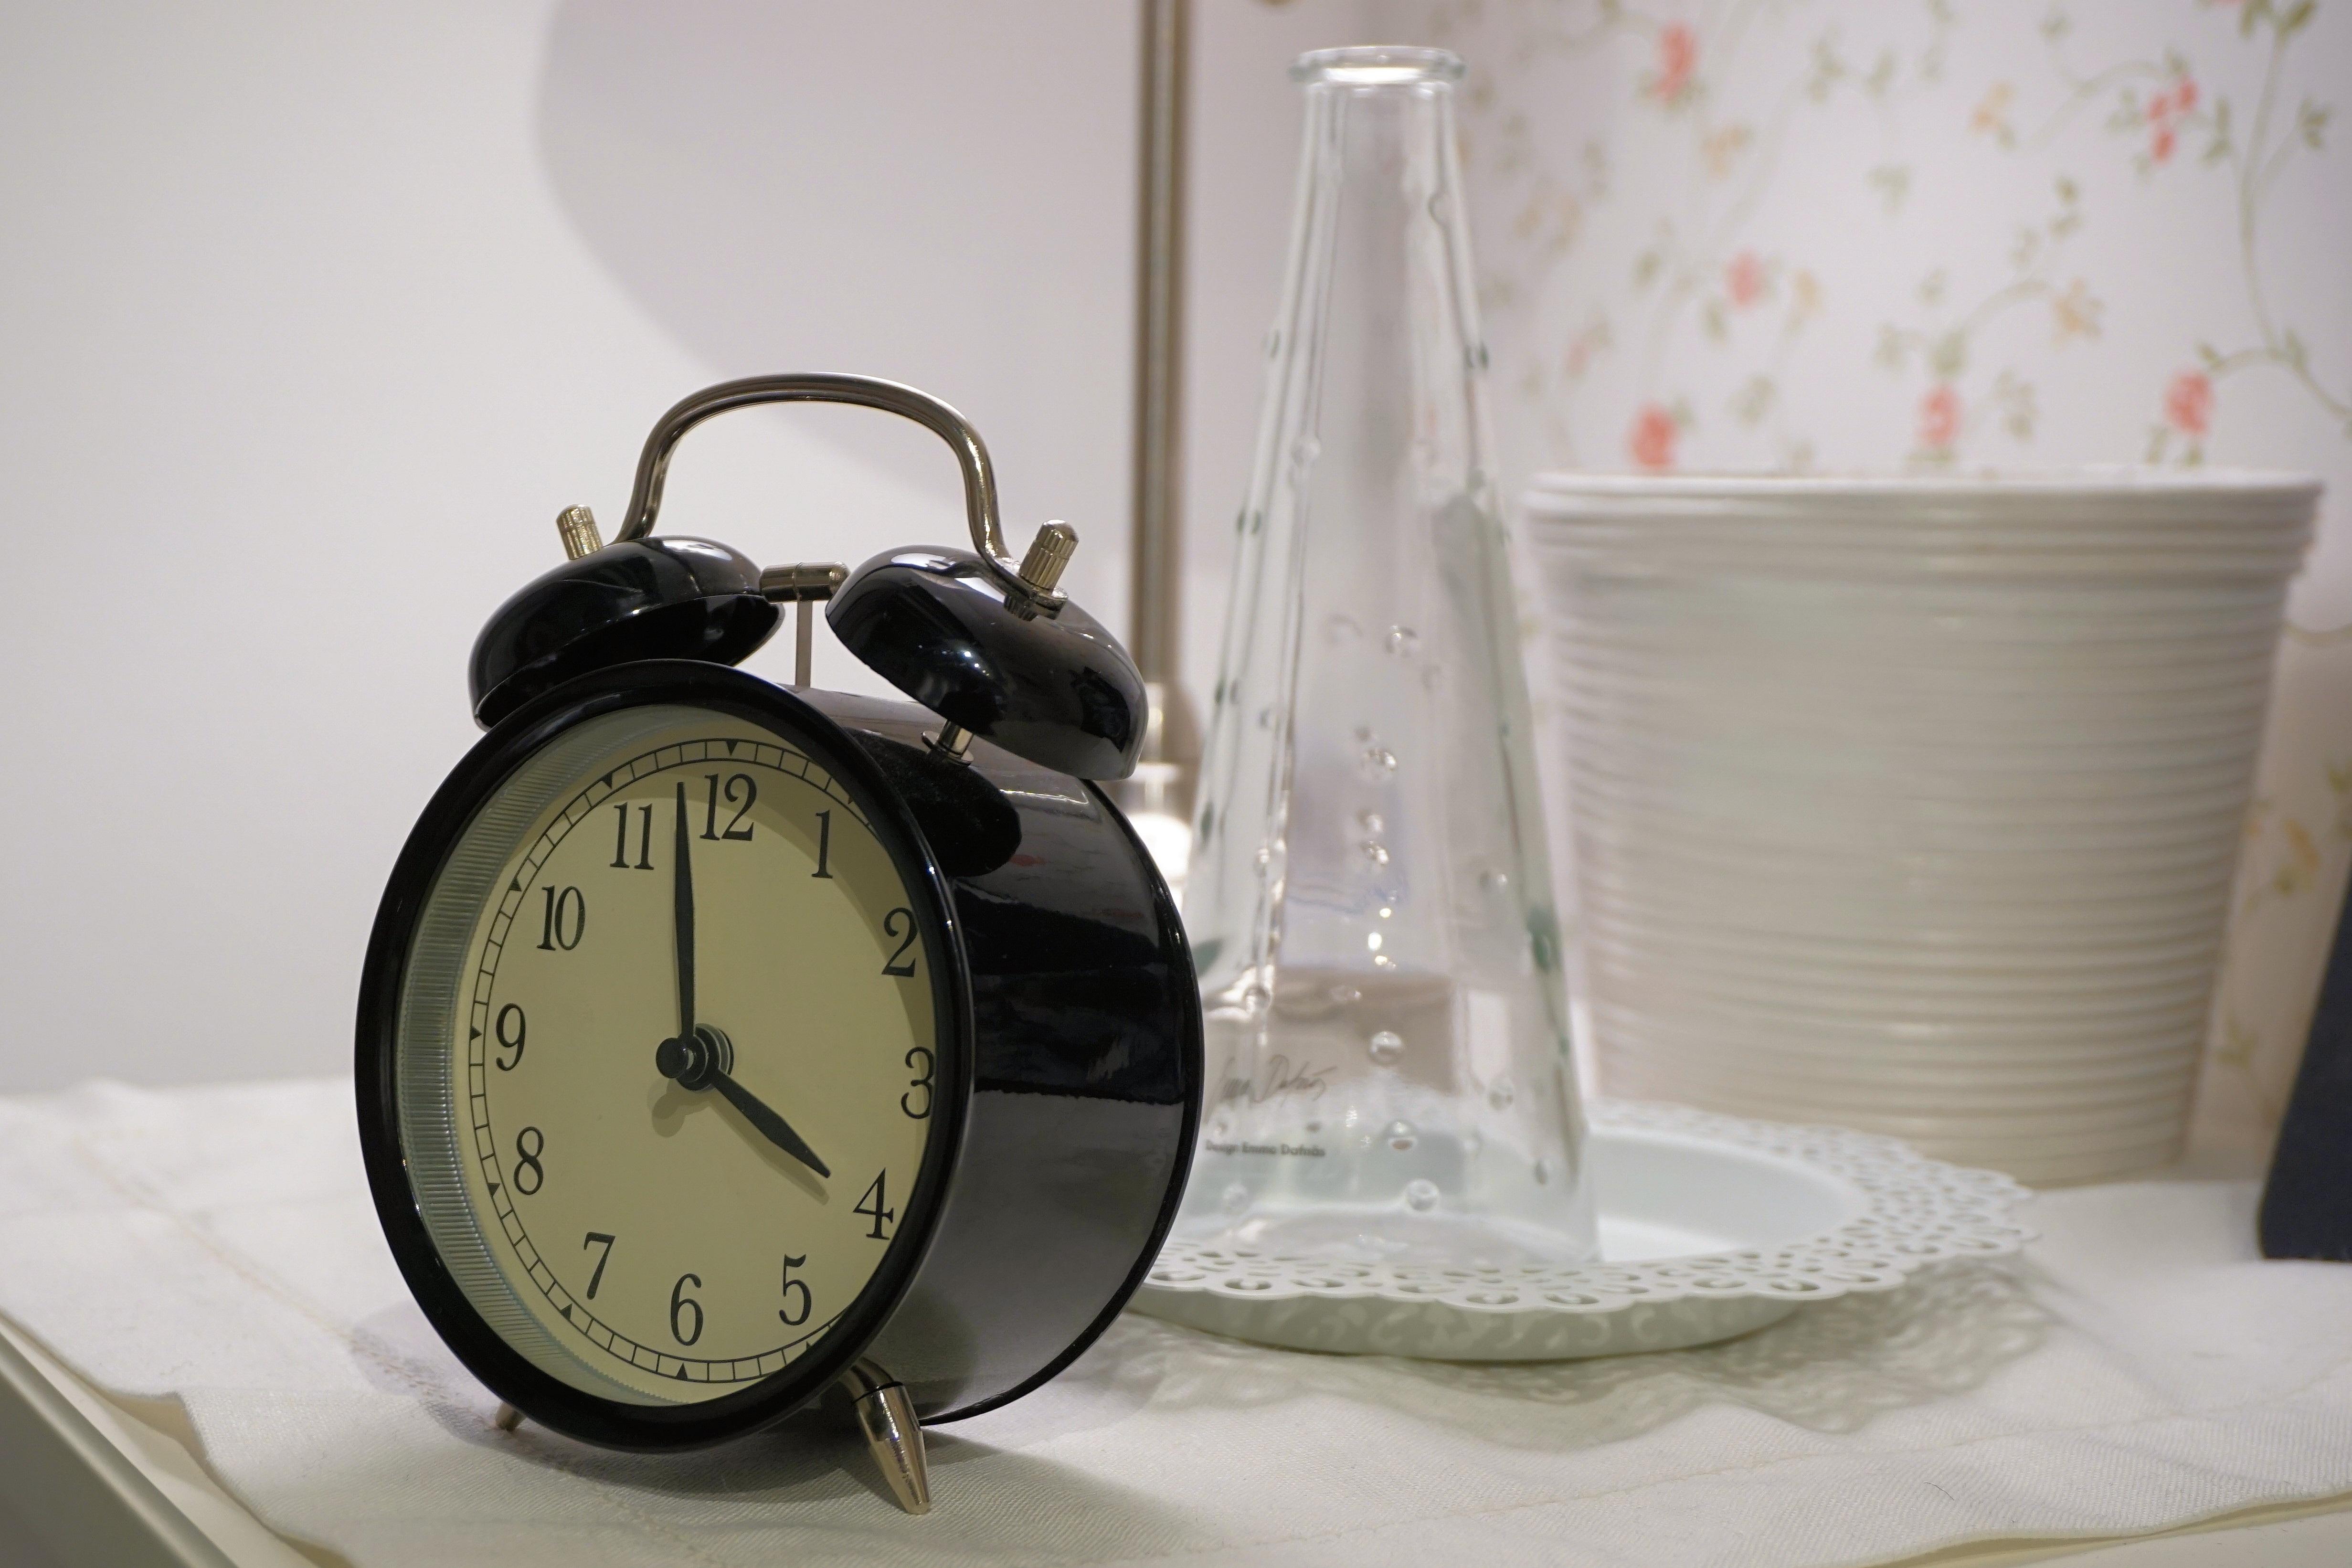 Free Images Hand Morning Hour Alarm Clock Lighting